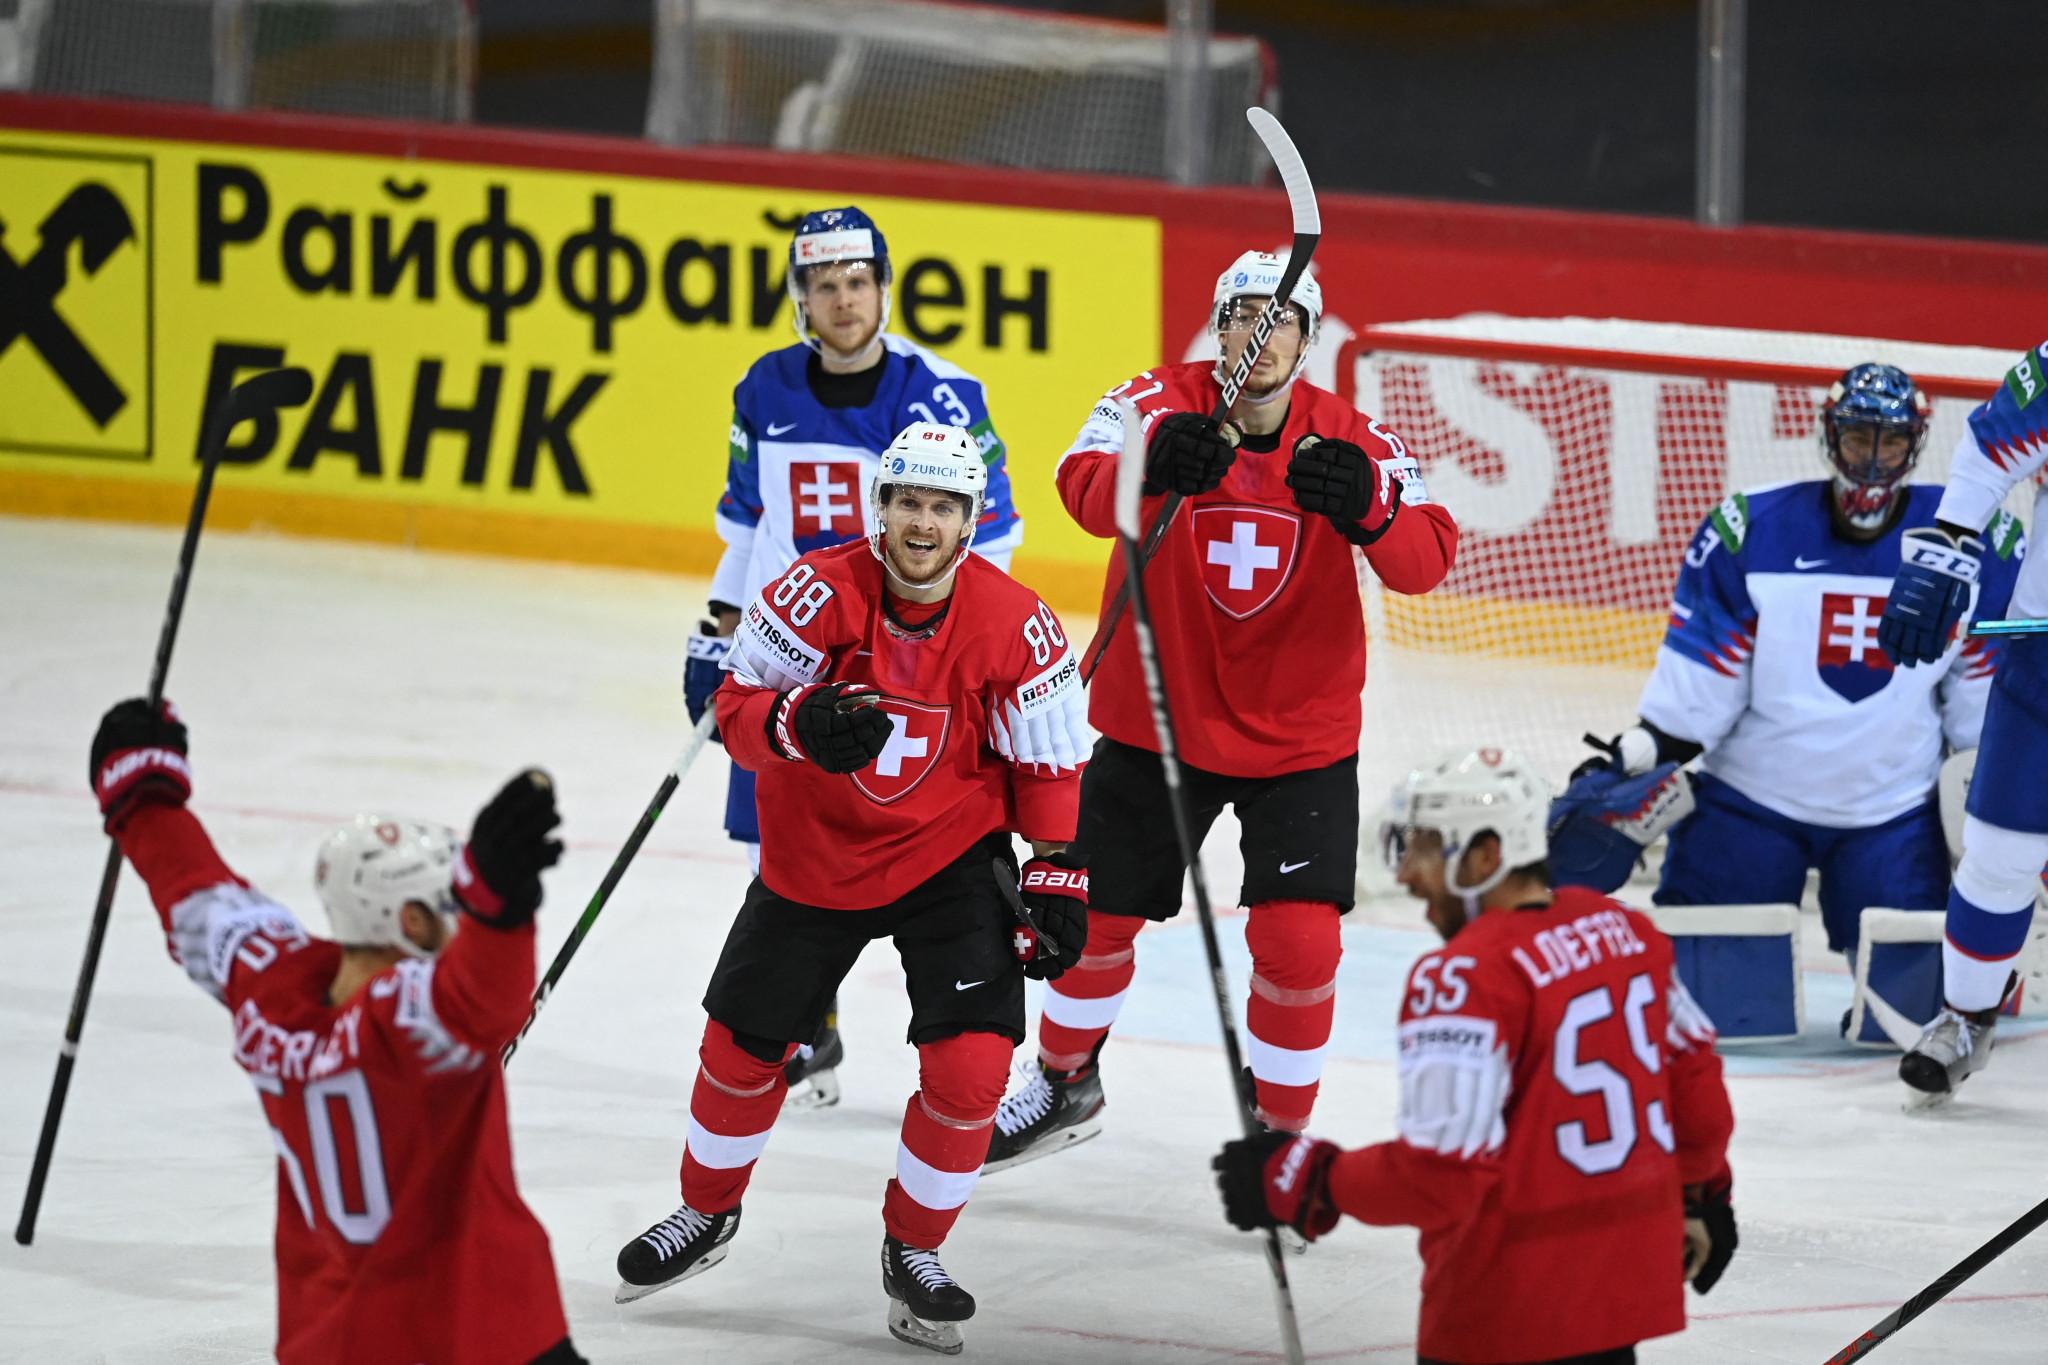 Switzerland net eight in Slovakia rout at IIHF Men's World Championship